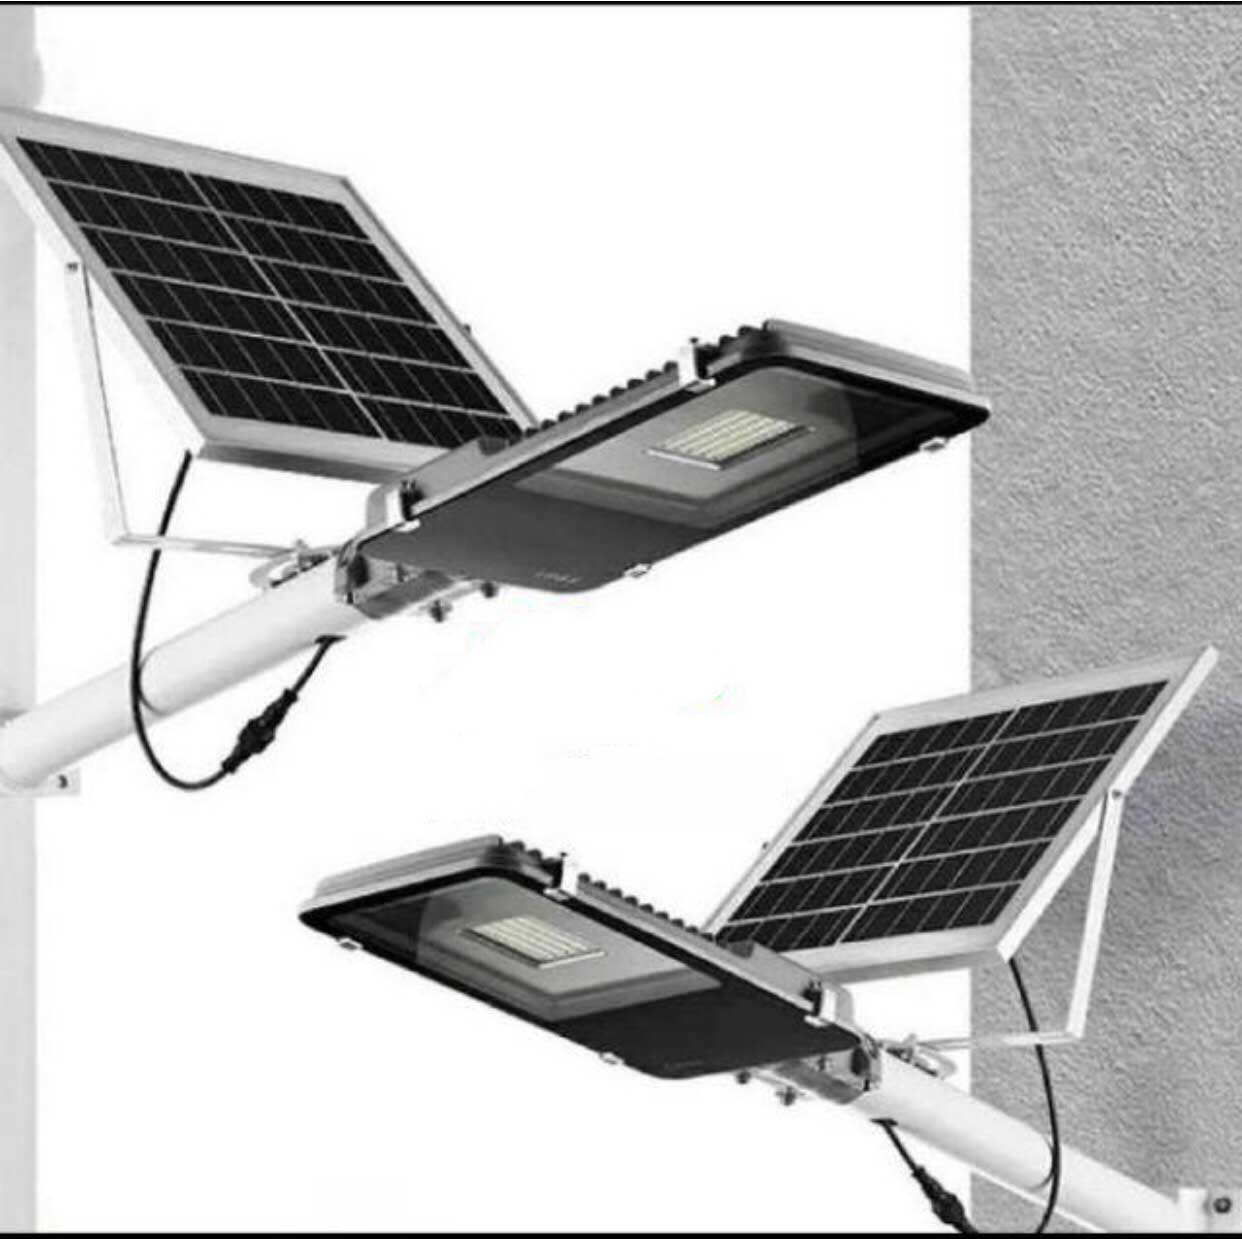 Jual Lampu Pju Solar Md 235